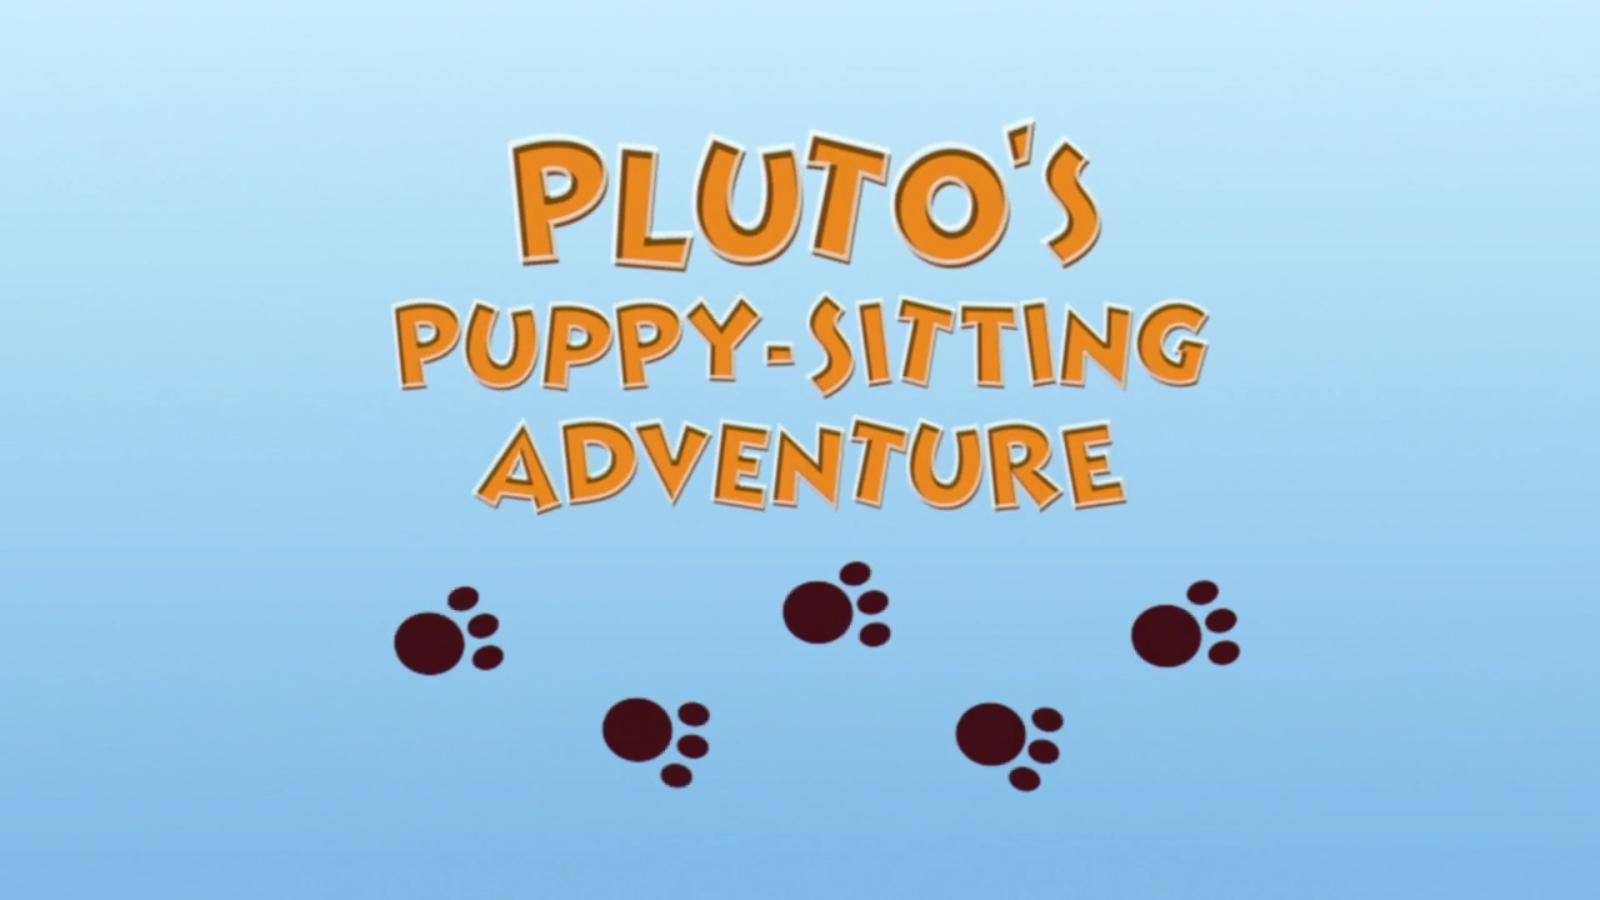 Pluto's Puppy-Sitting Adventure